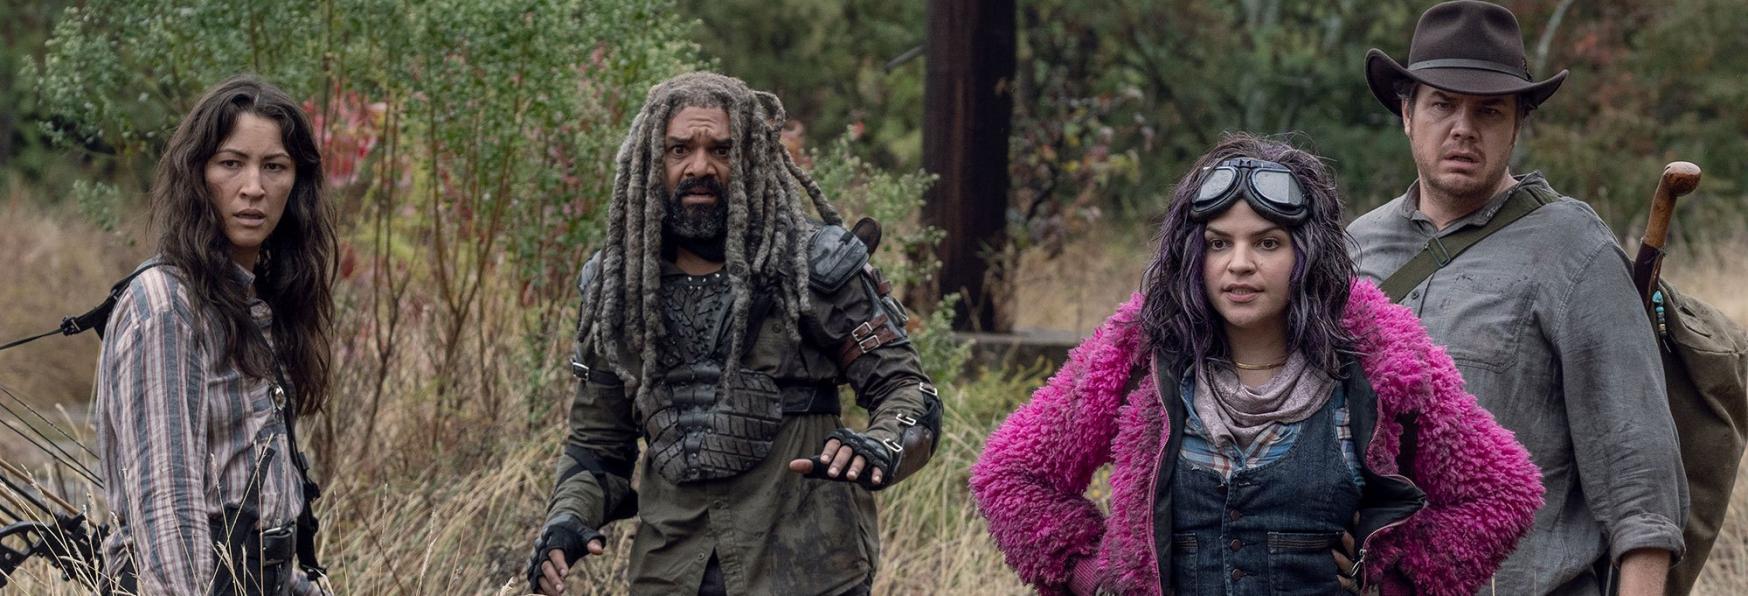 Tales of the Walking Dead: trovato lo Showrunner per la Serie TV Spin-off